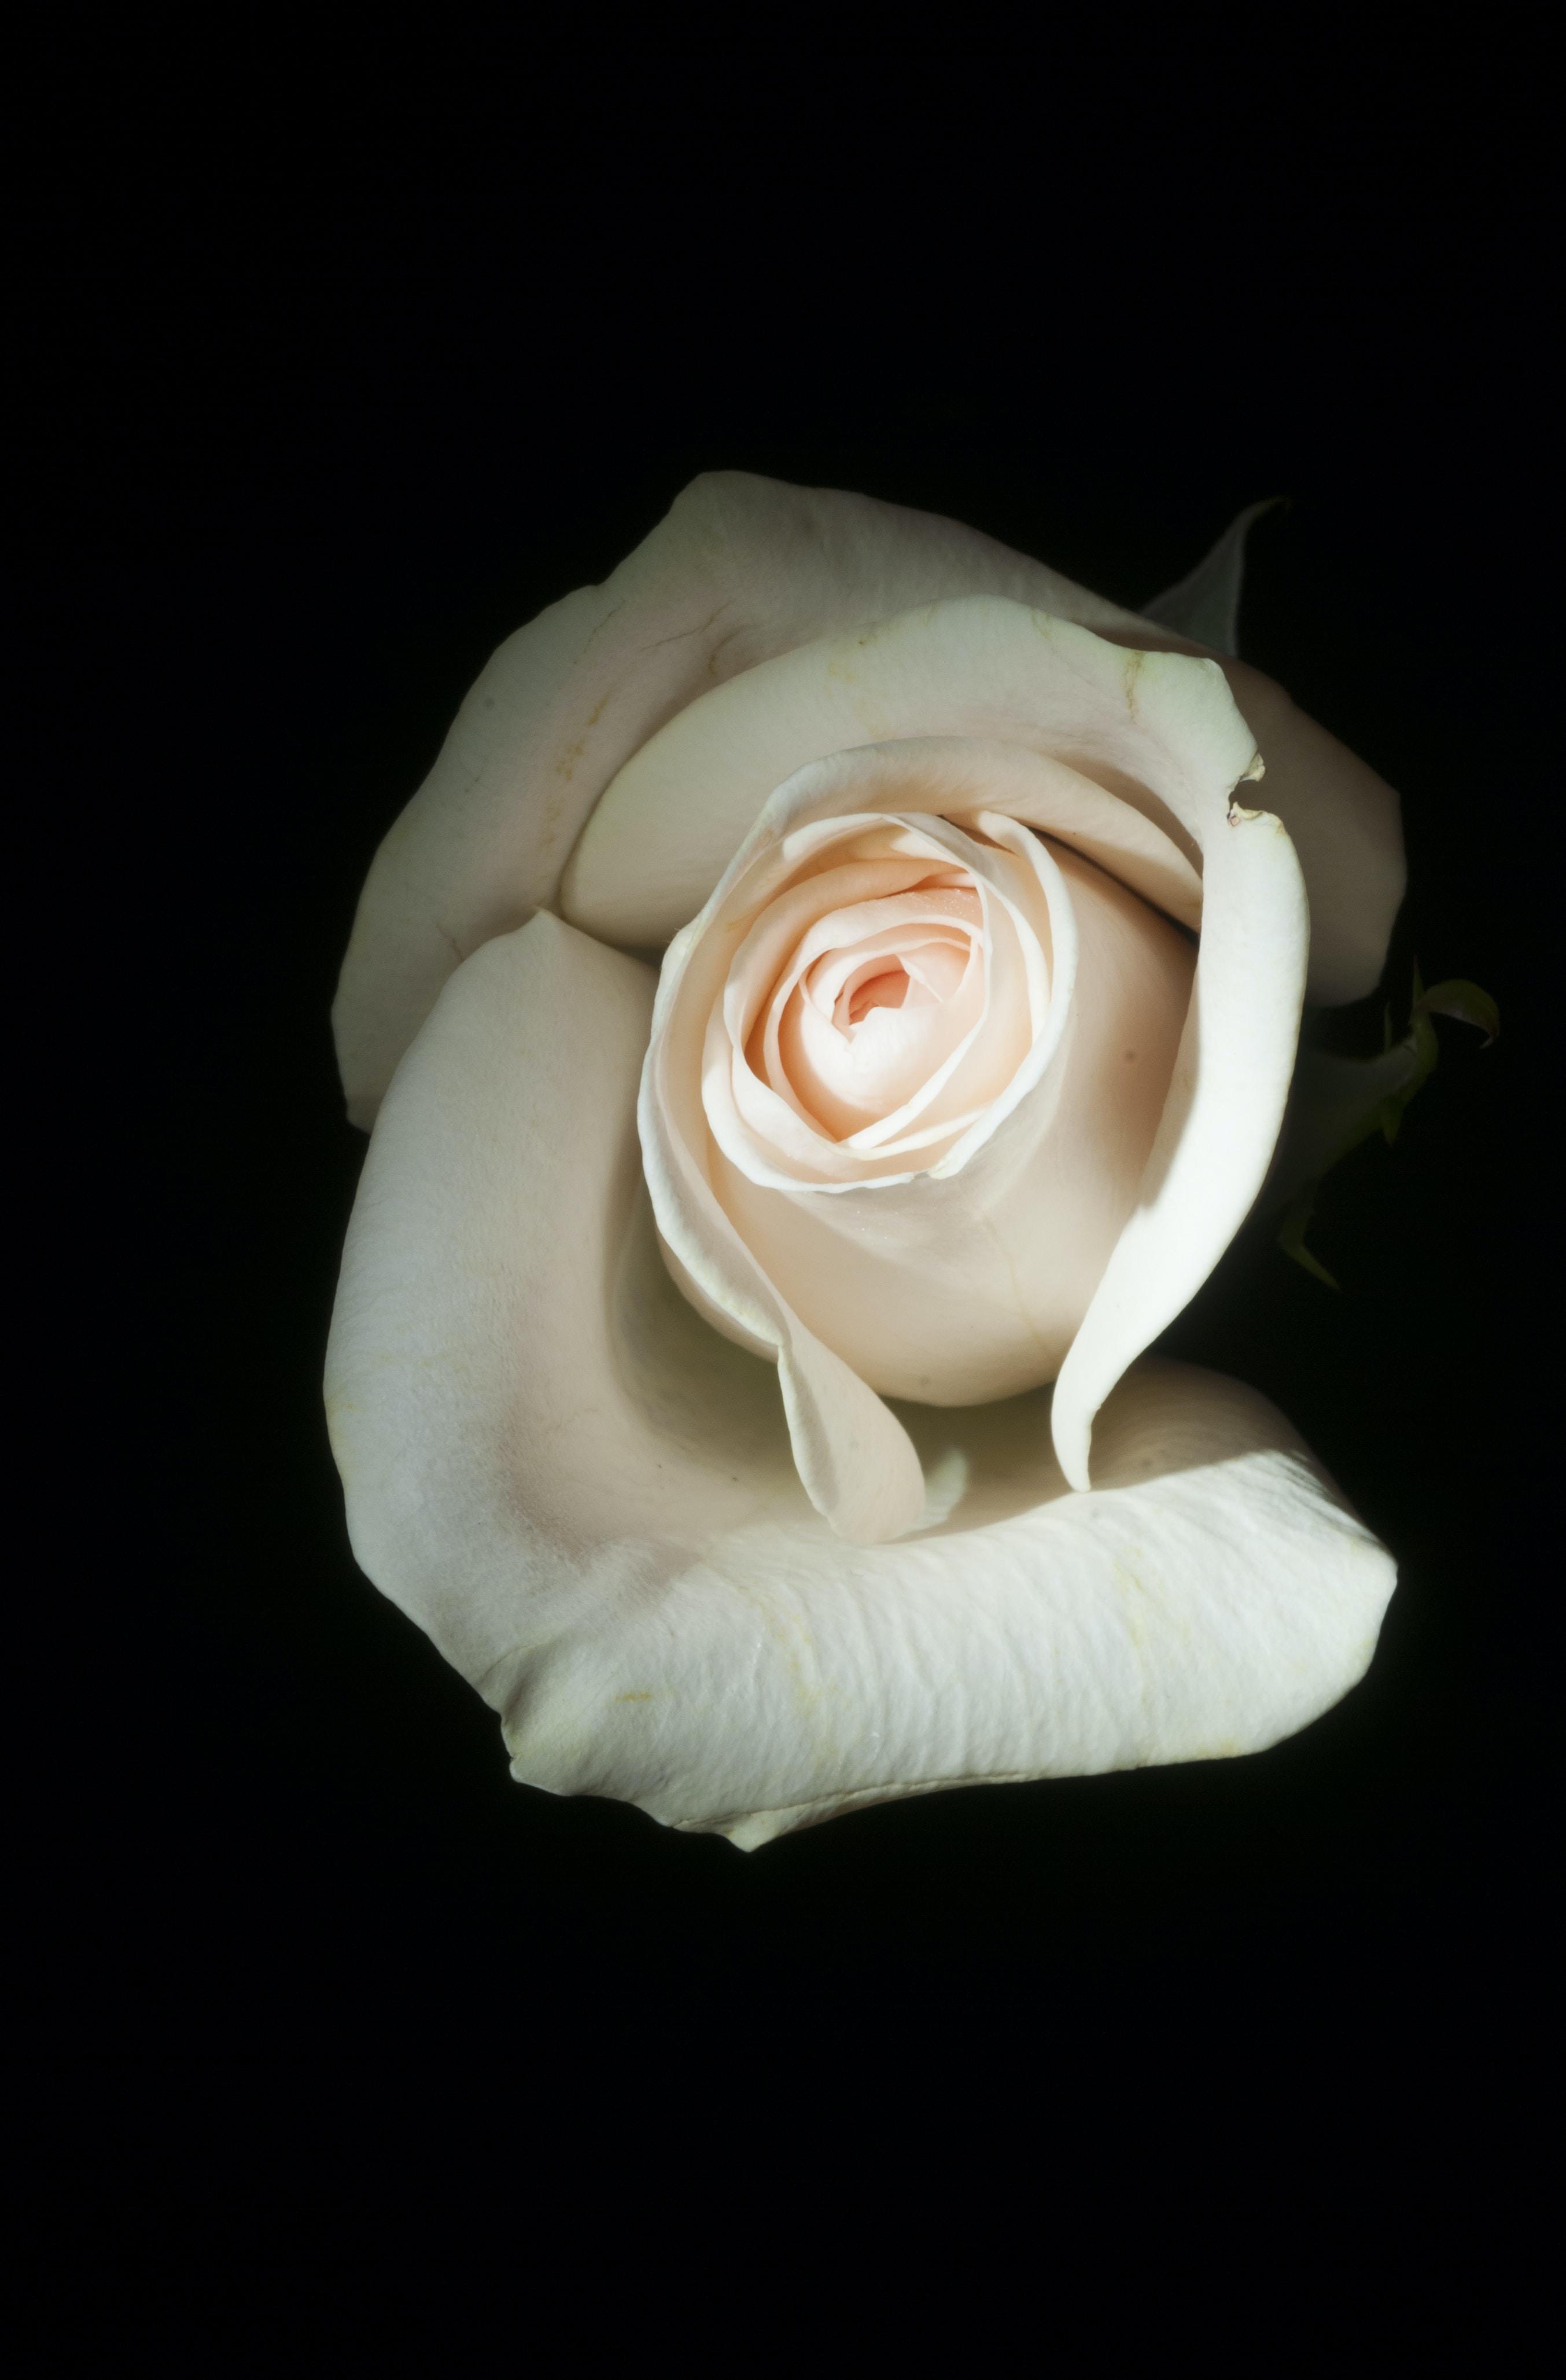 close-up photo of white rose